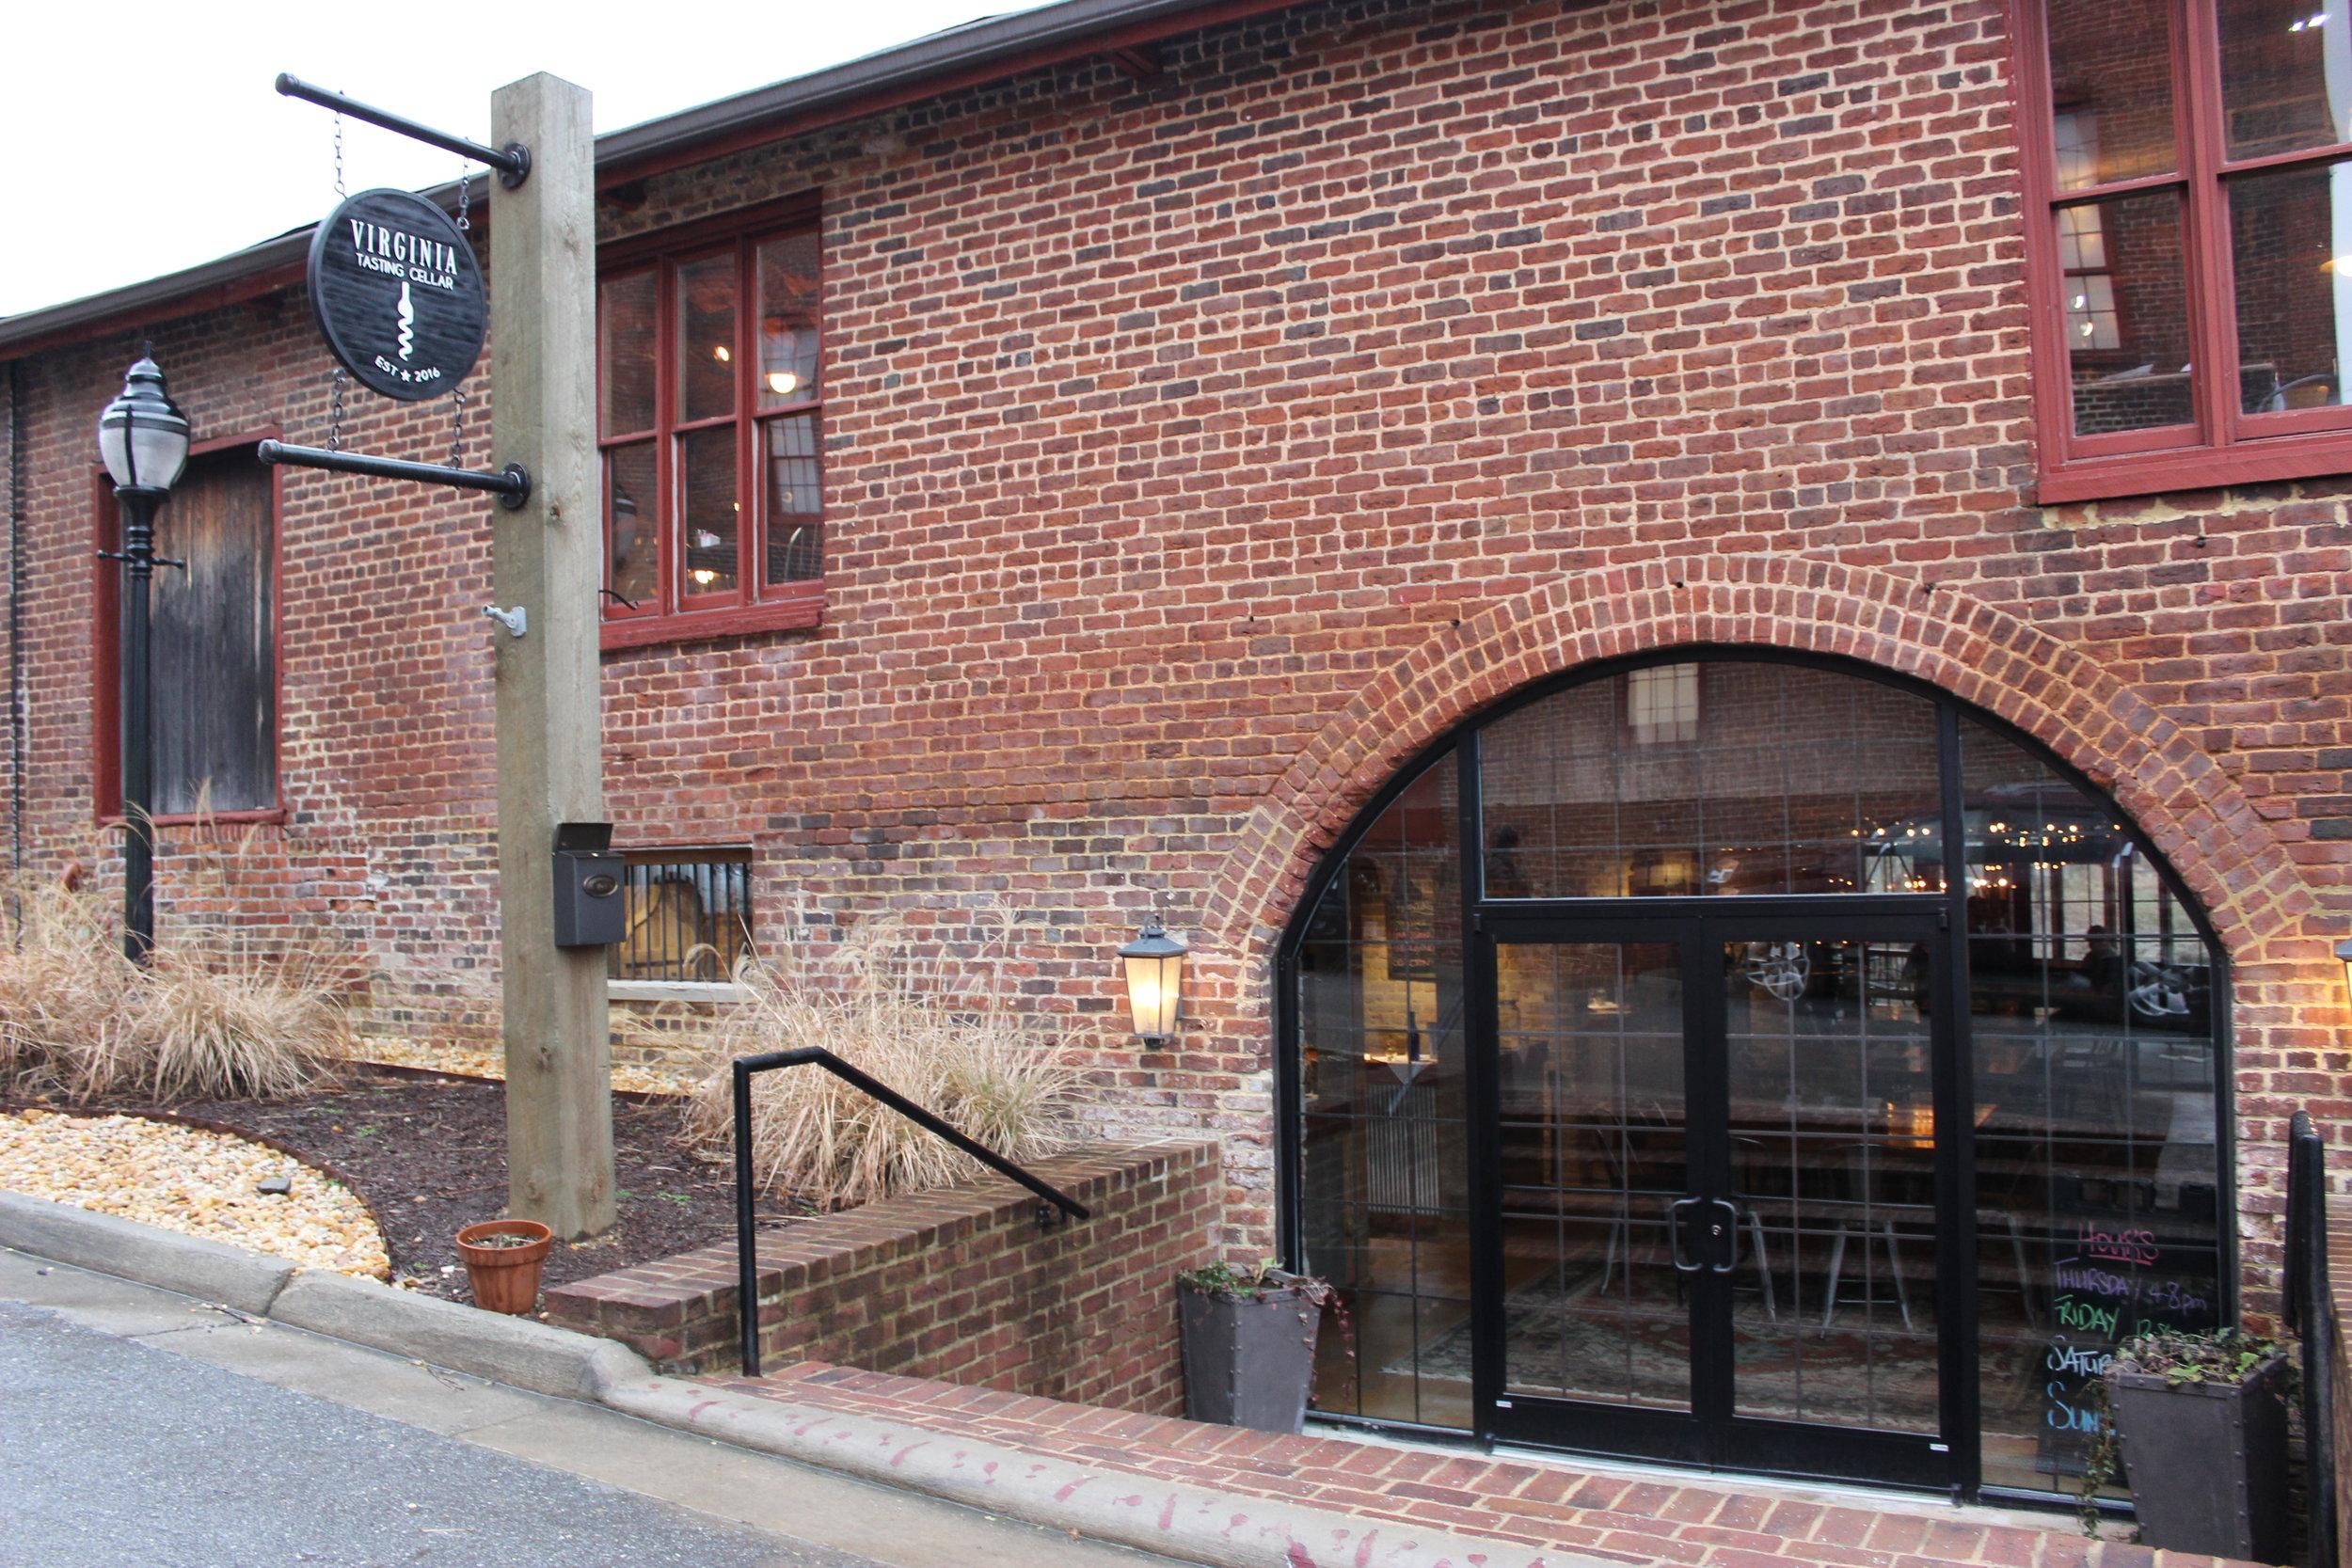 The Virginia Tasting Cellar